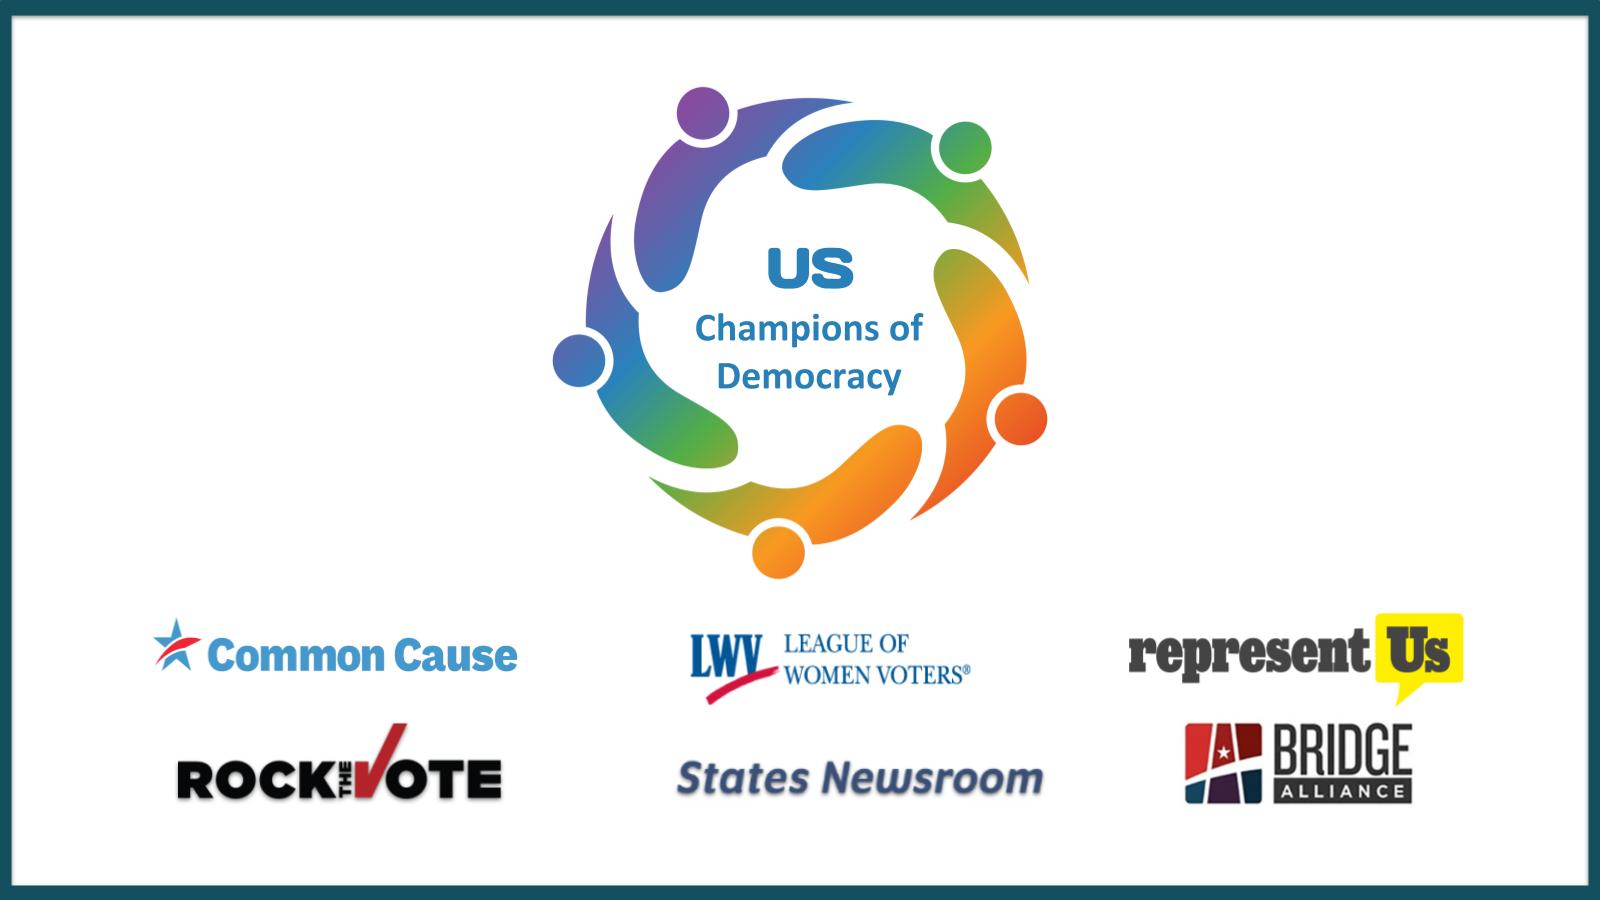 US Champions of Democracy